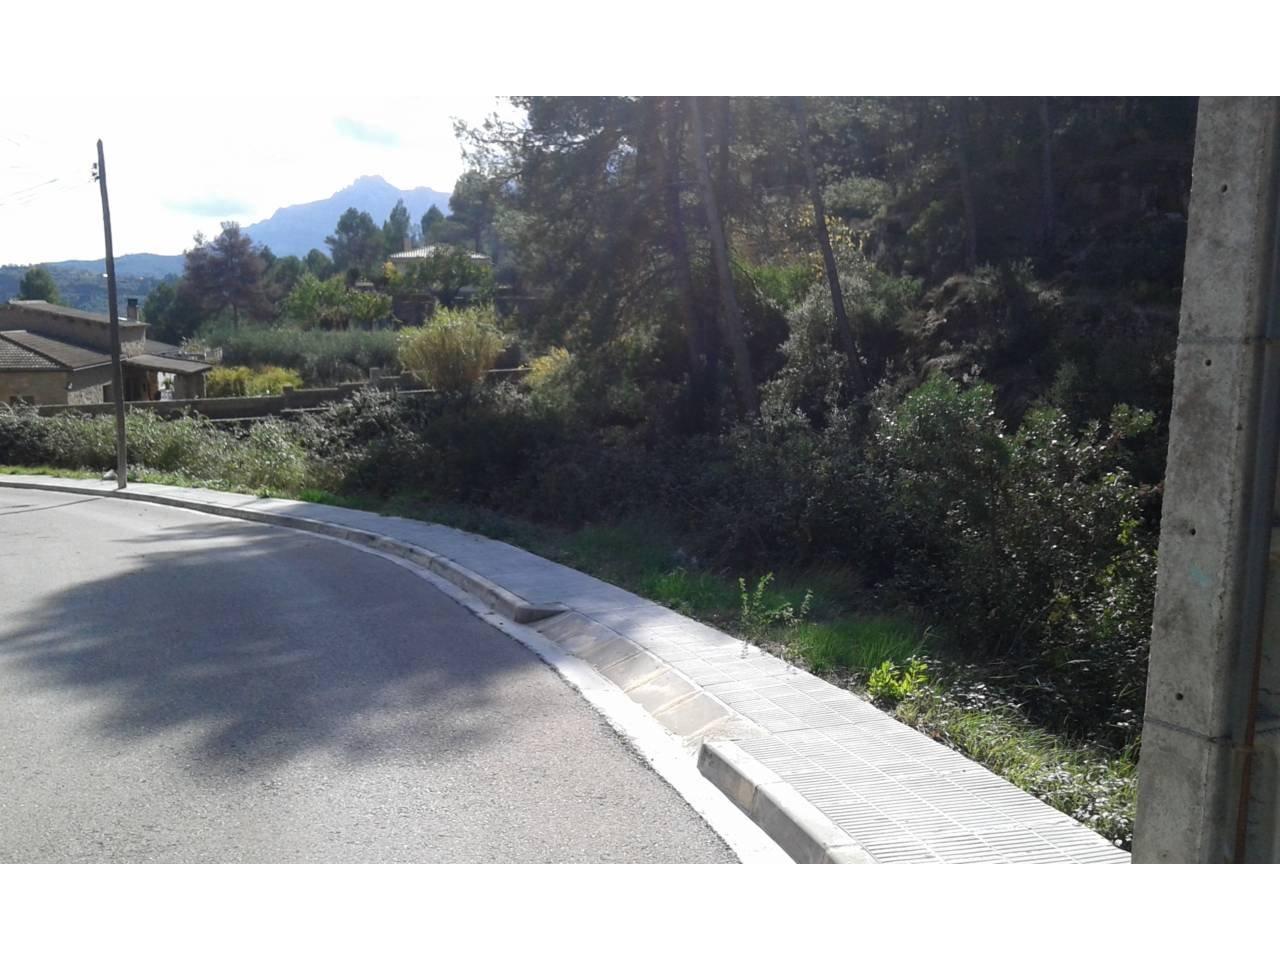 Terreno en URB. MÁS PLANOI (Castellgalí)